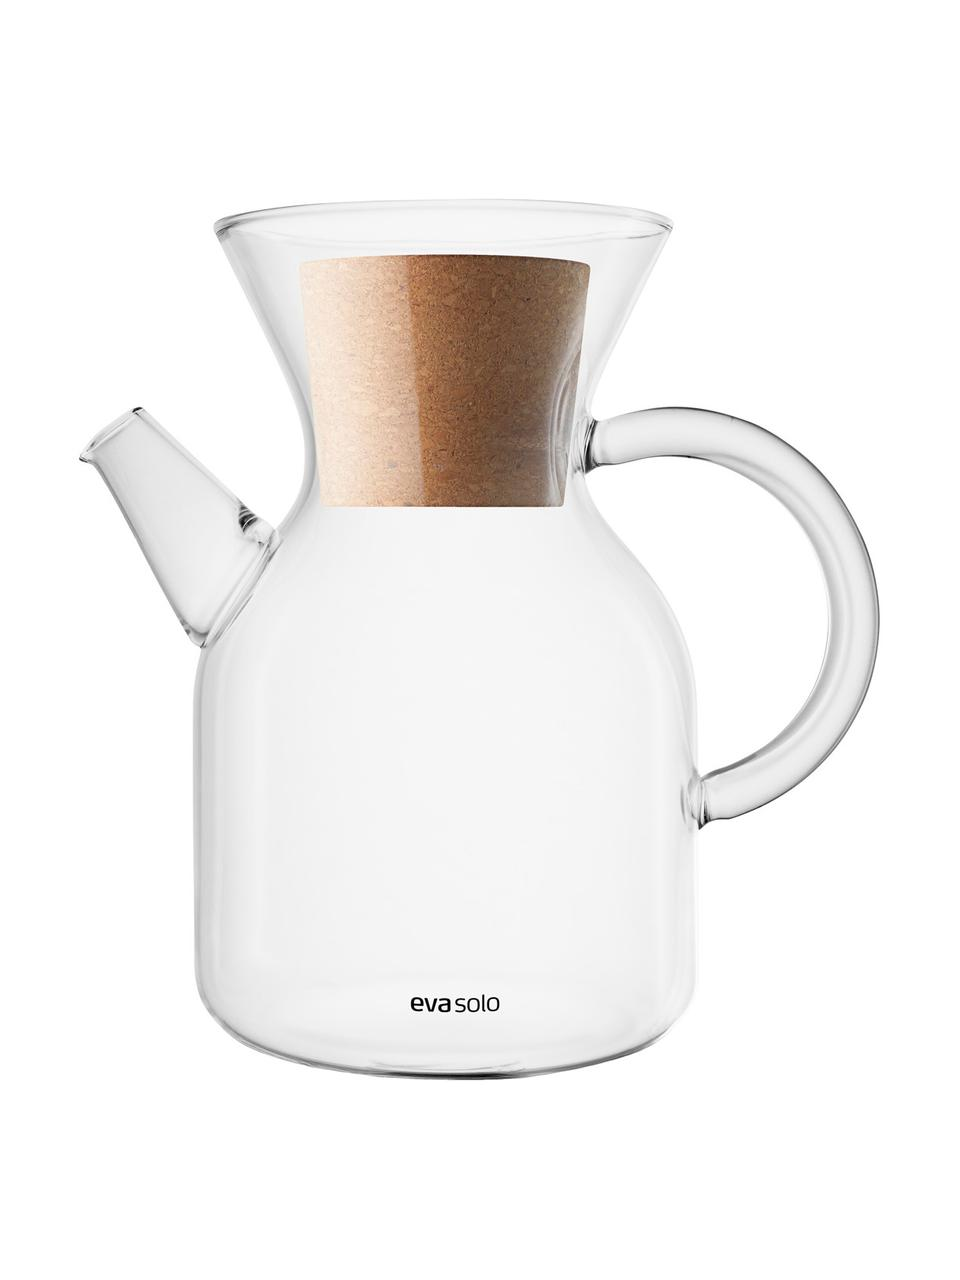 Komplet zaparzacza do kawy Vetro, 3 elem., Transparentny, stal szlachetna, 1 l